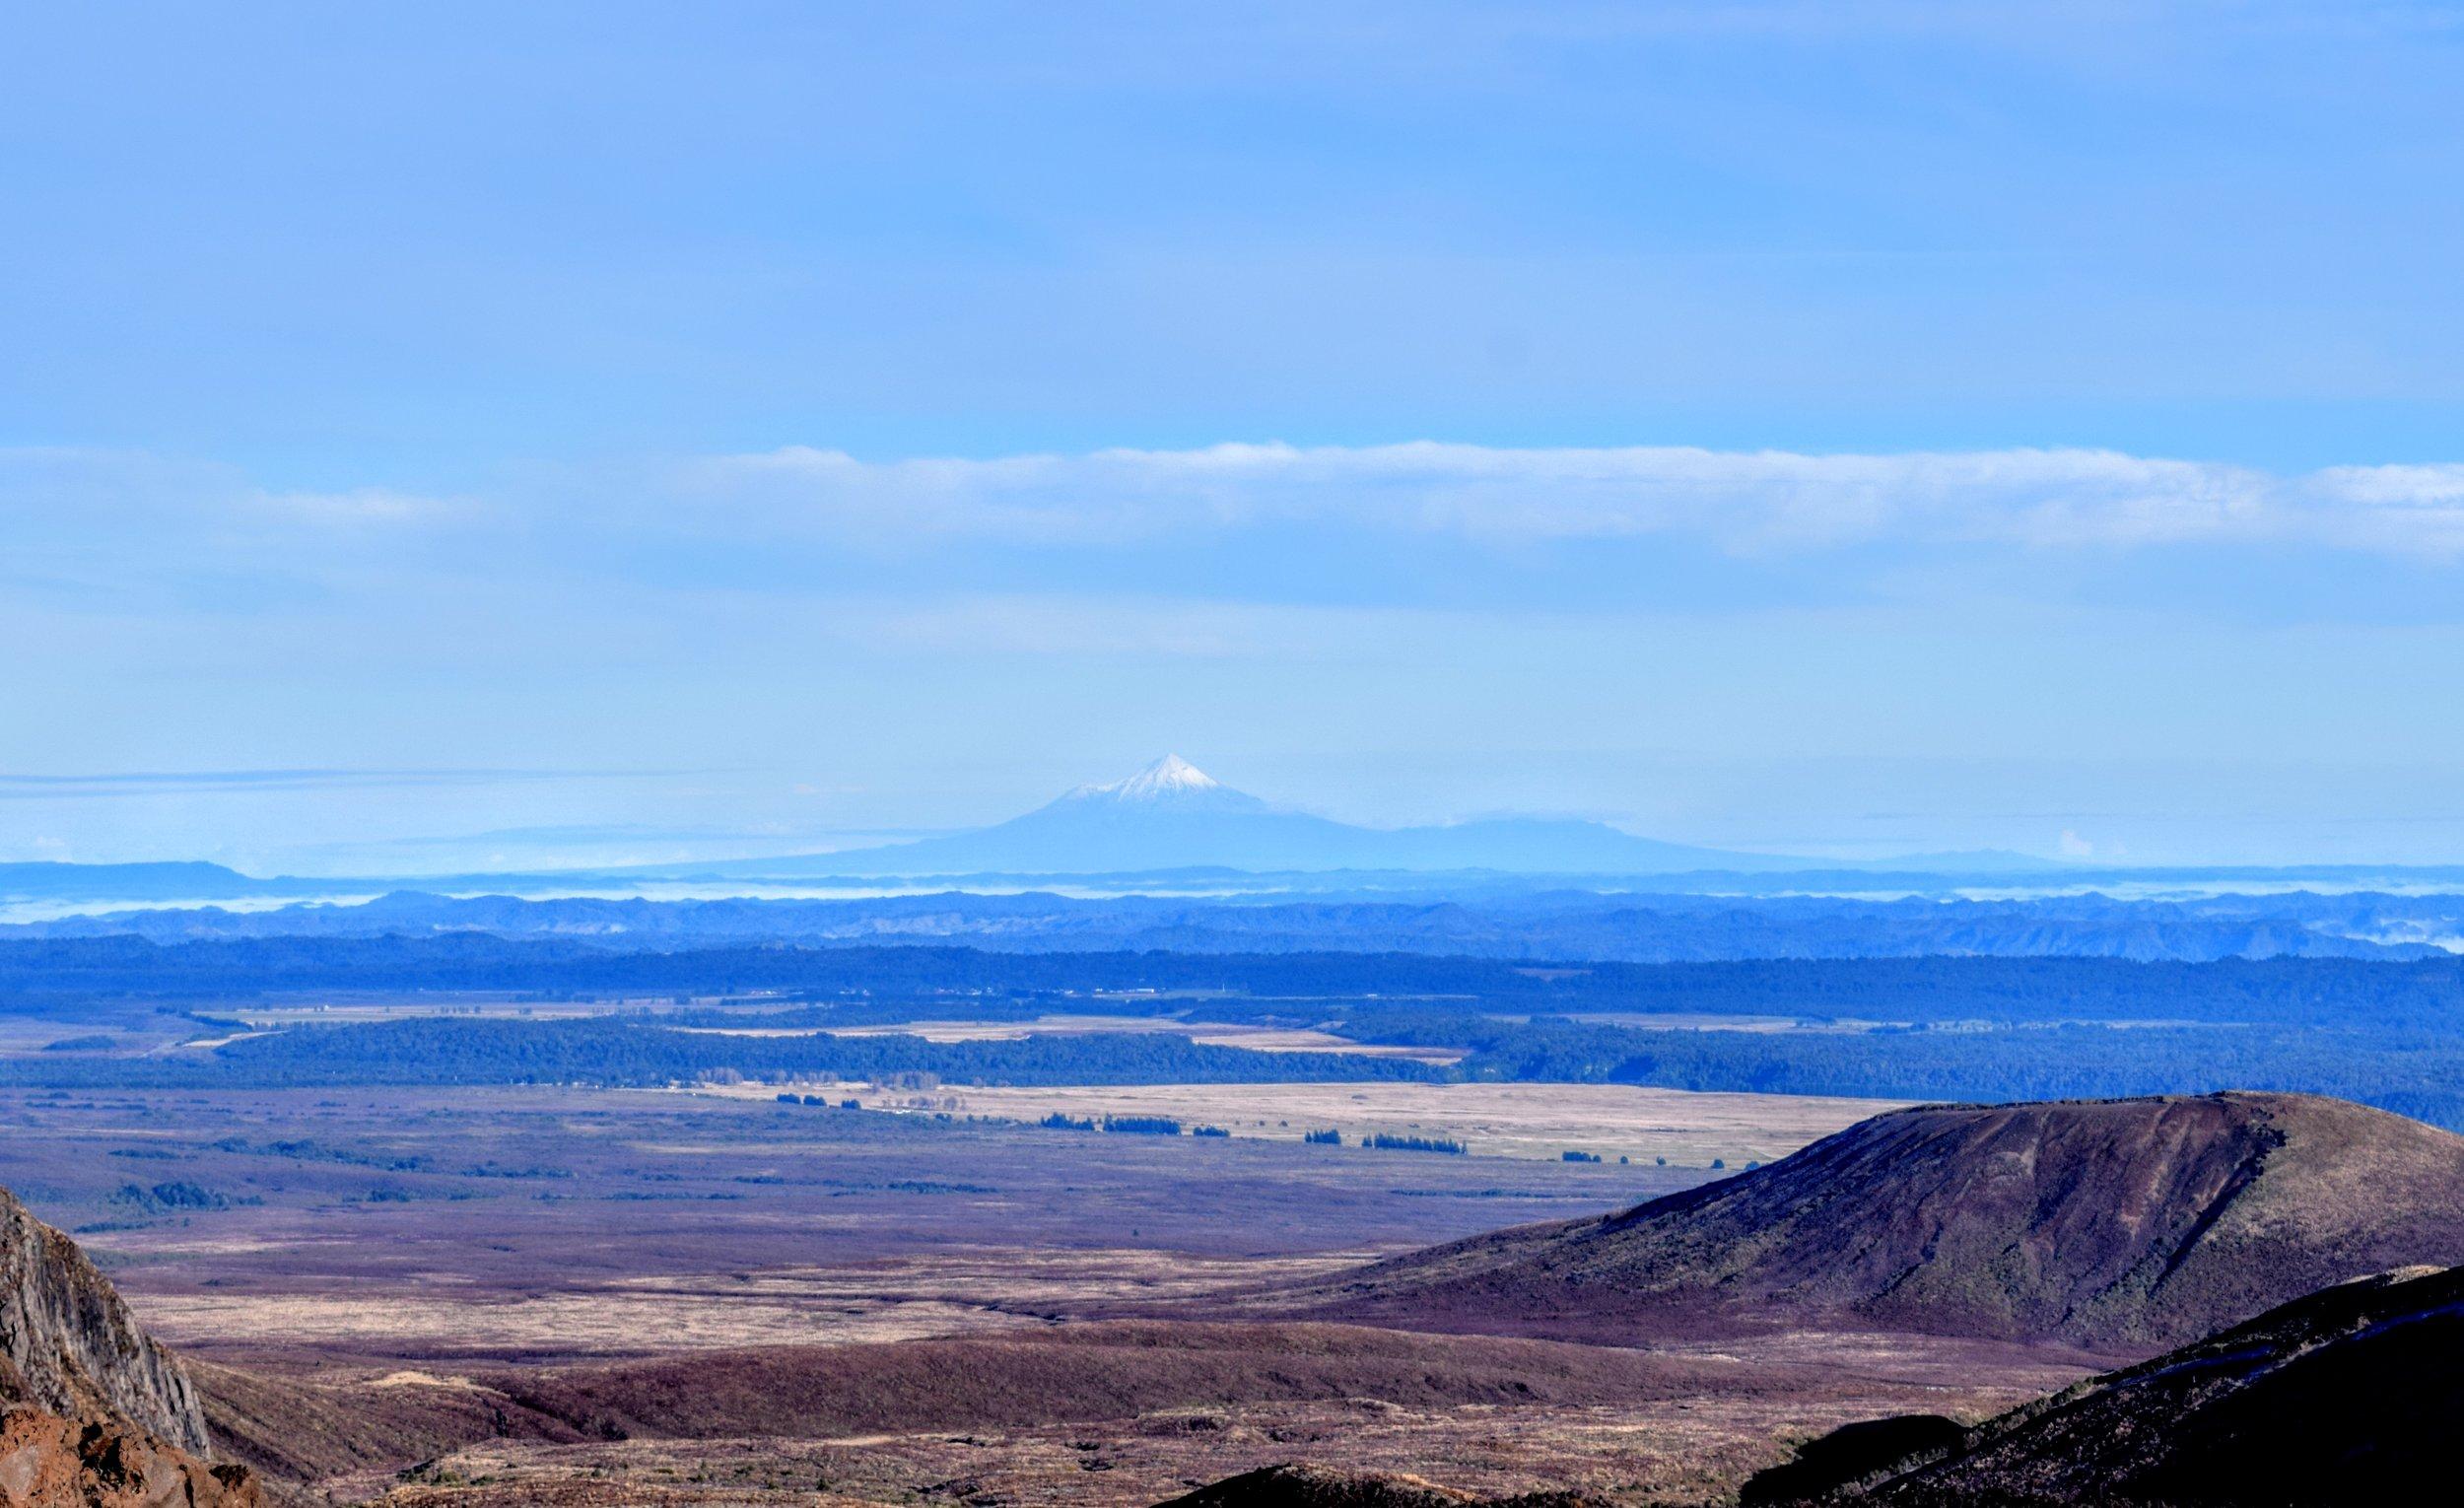 Mount Taranaki, seen from the foot of Ngauruhoe. Taranaki is 130 km (80 miles) due west of Tongariro.